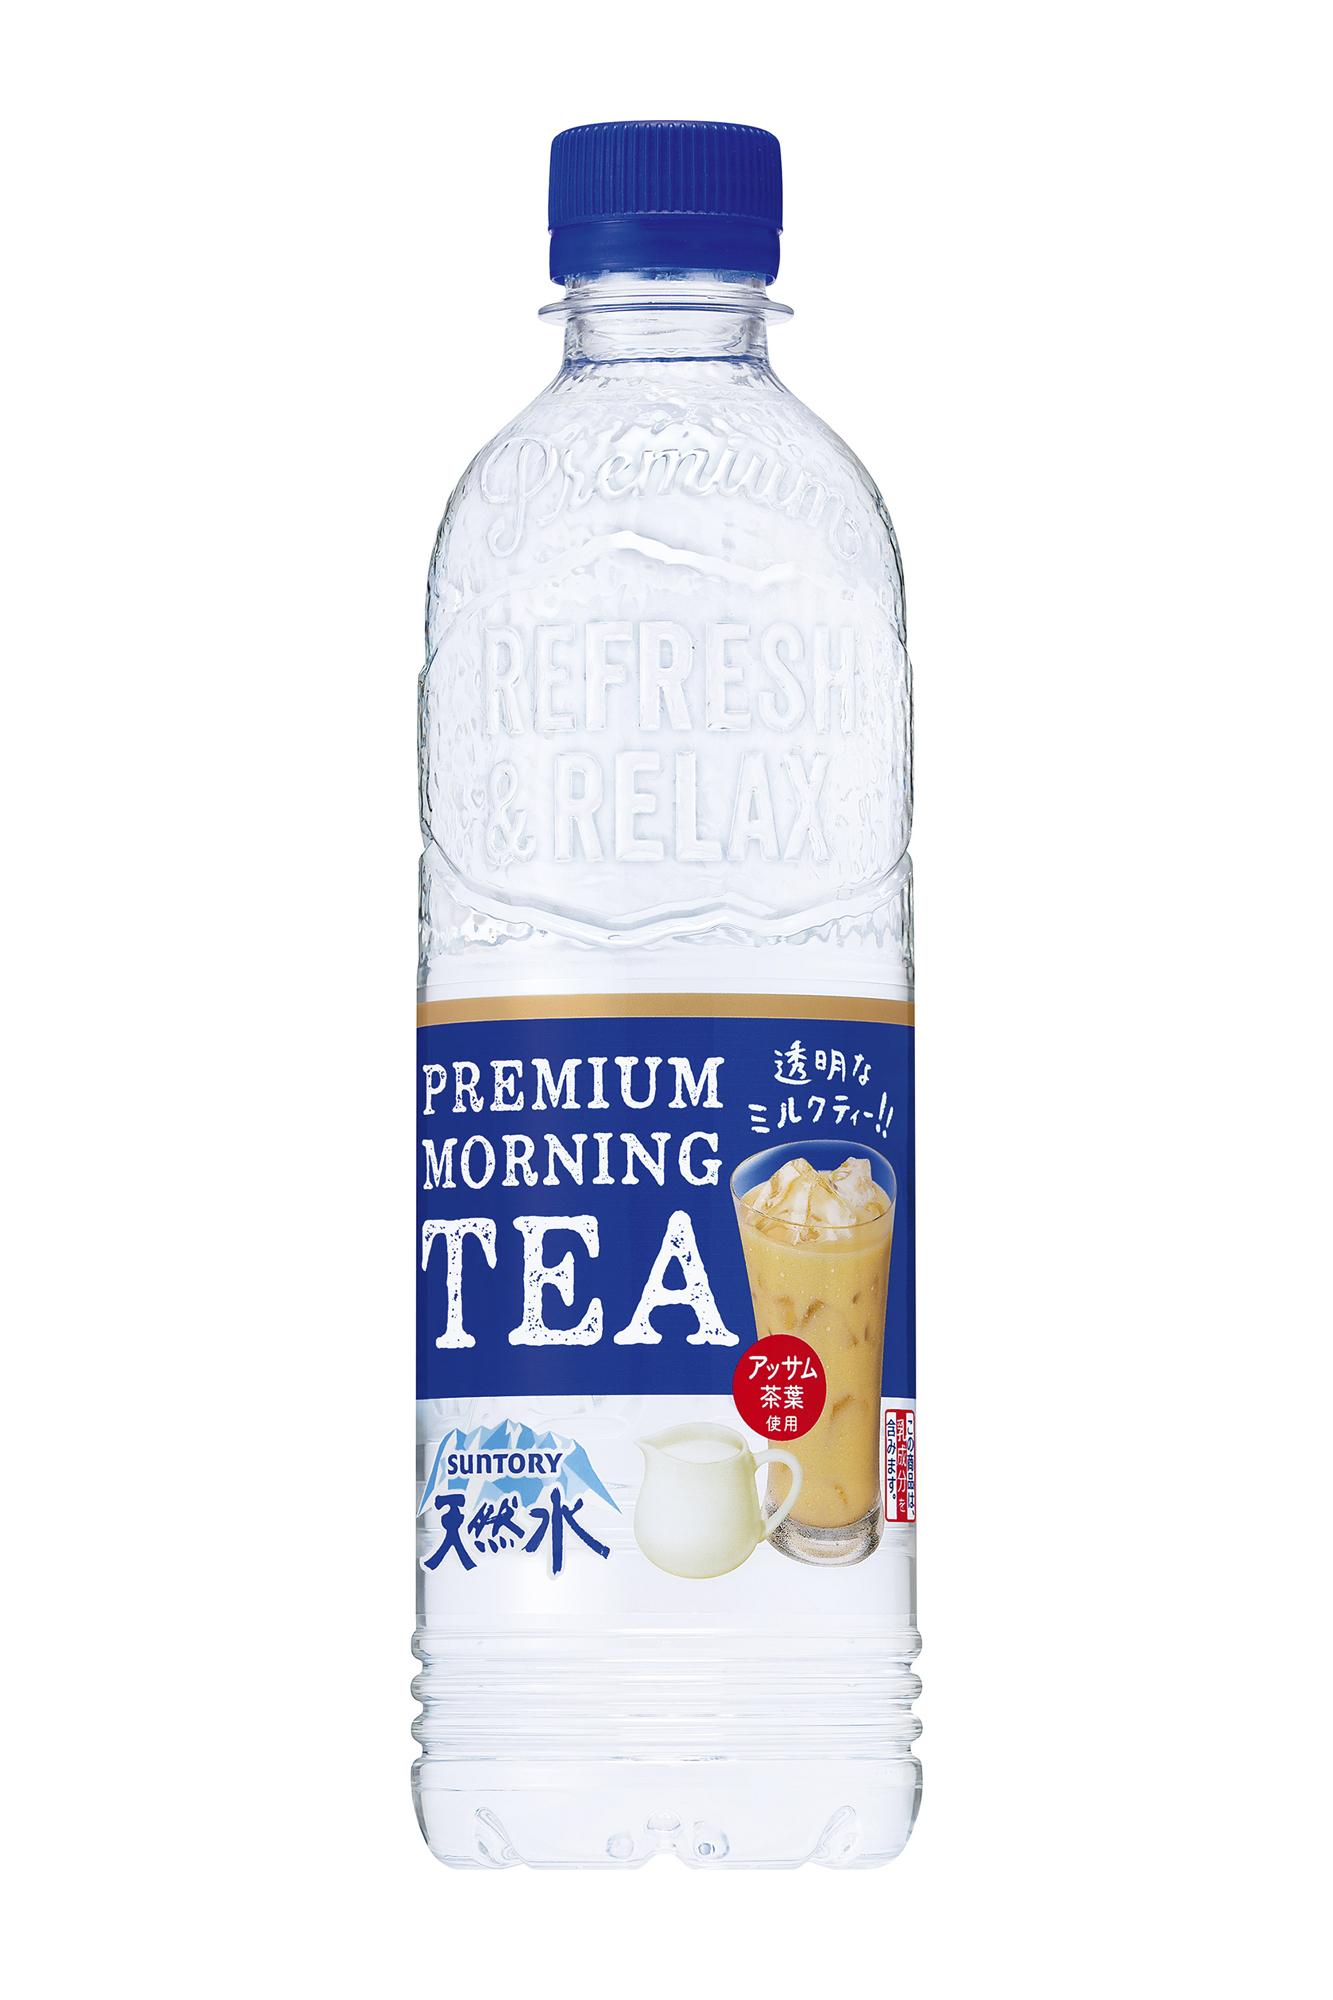 Image result for suntory premium morning tea